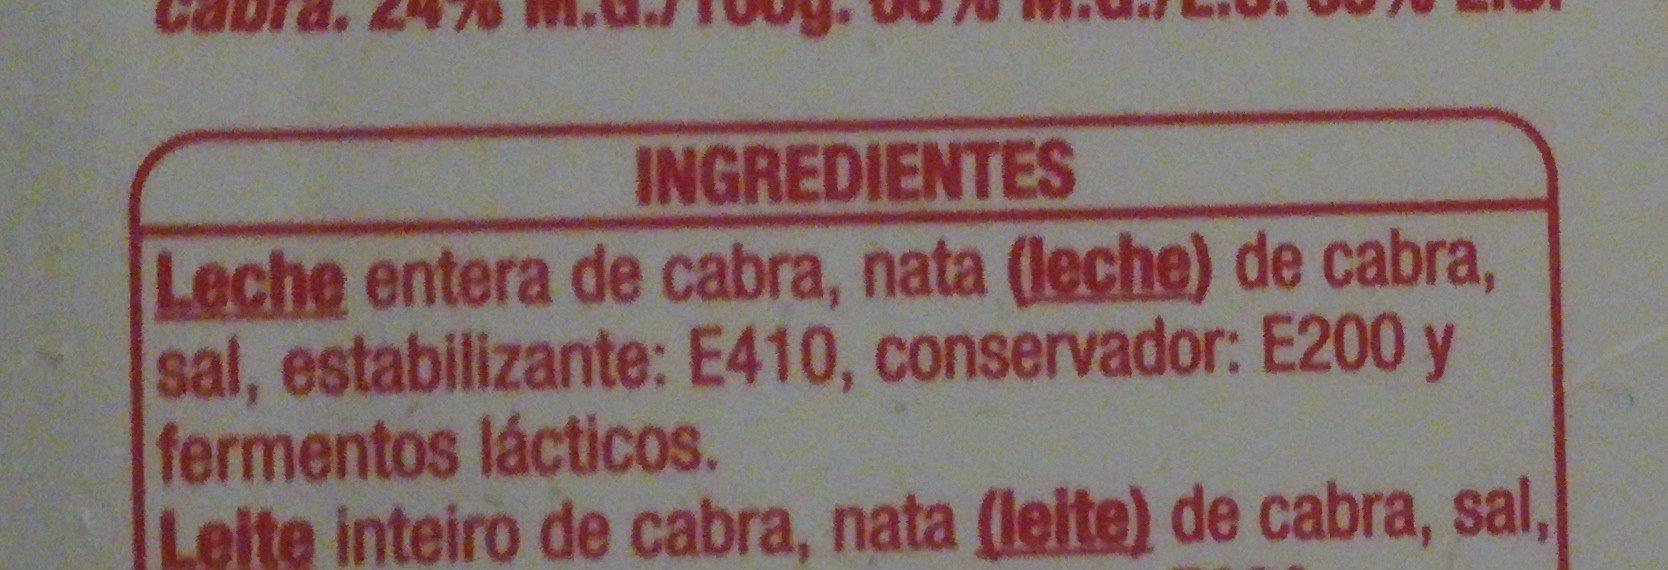 Fromage de chevre à tartiner - Ingredientes